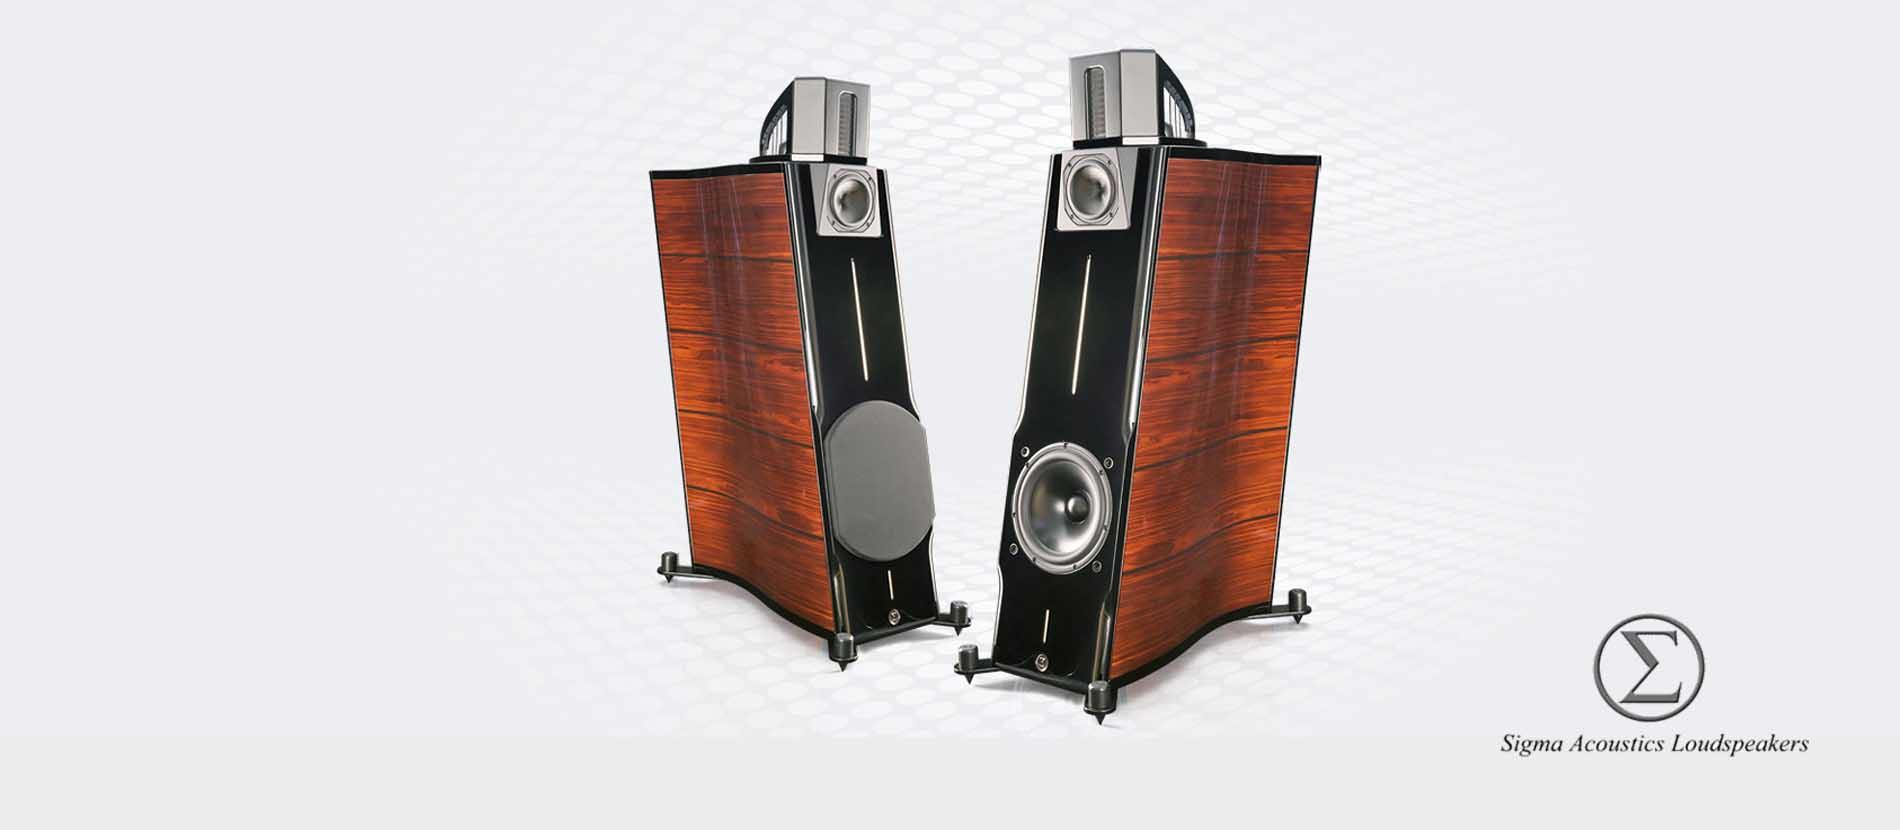 Sigma Acoustics